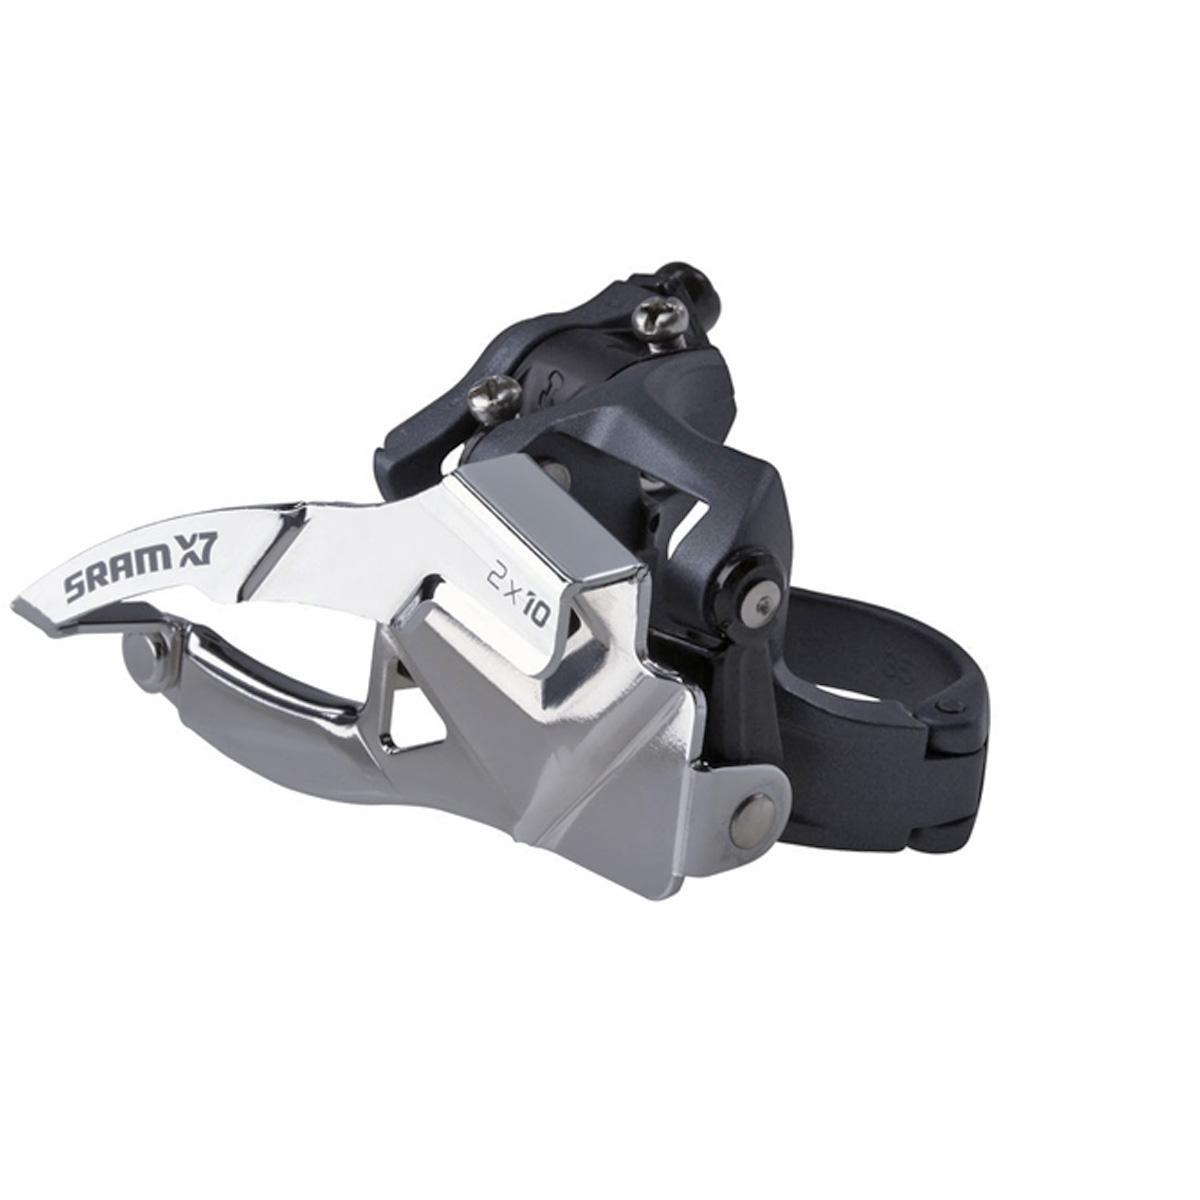 Dérailleur avant VTT SRAM X7 2x10 Fixation collier bas S1 42 dents Tirage Haut/Bas